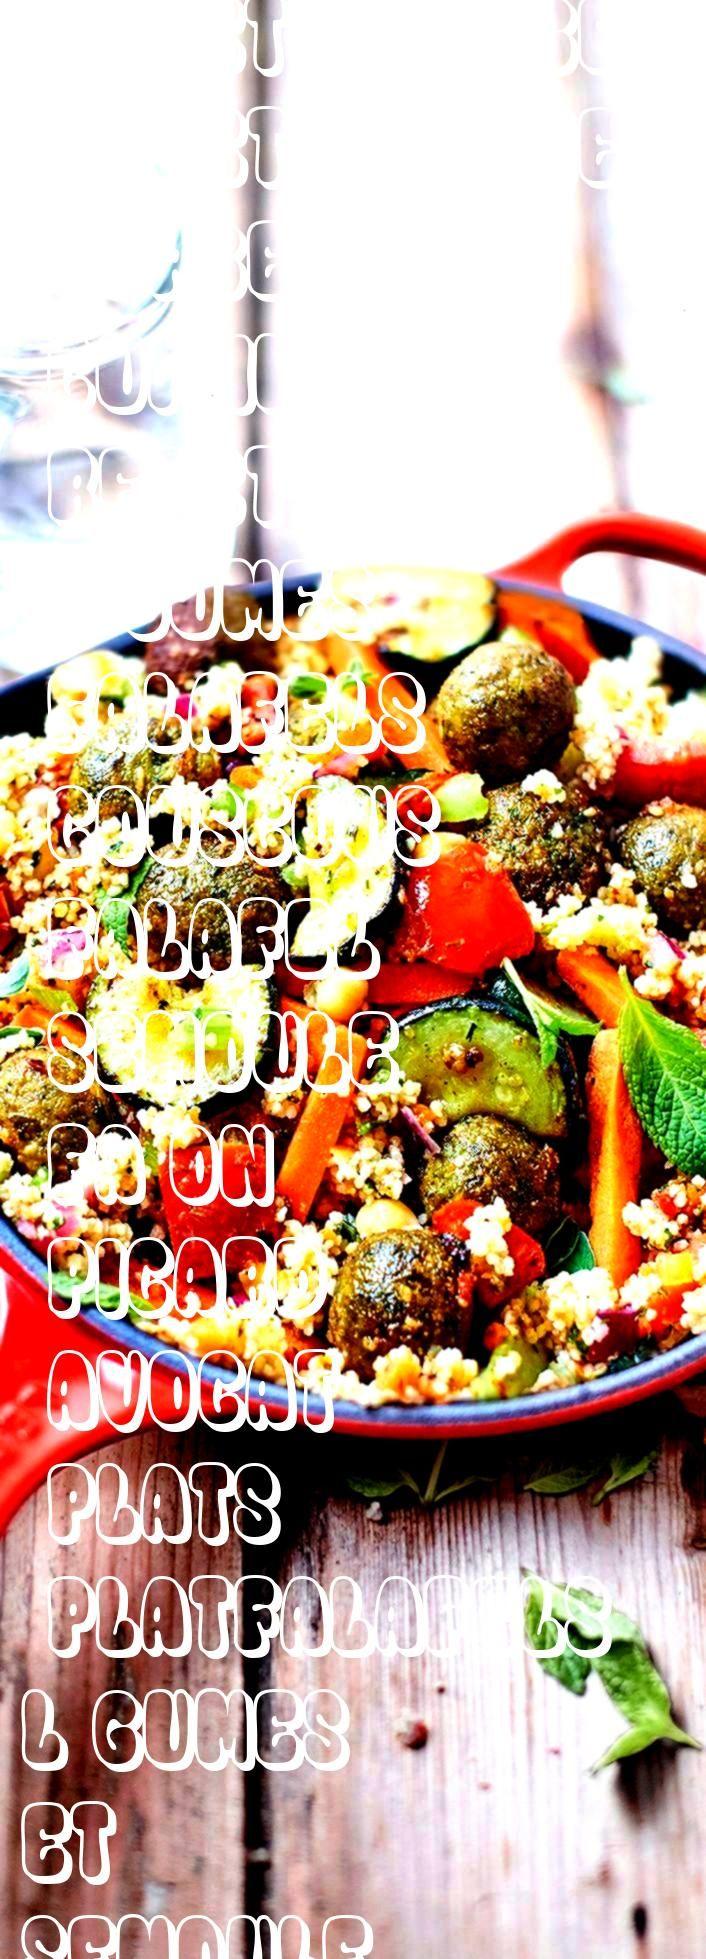 Recettesvegetarienne Vegetarienne Surgeles Cuisines Recettes